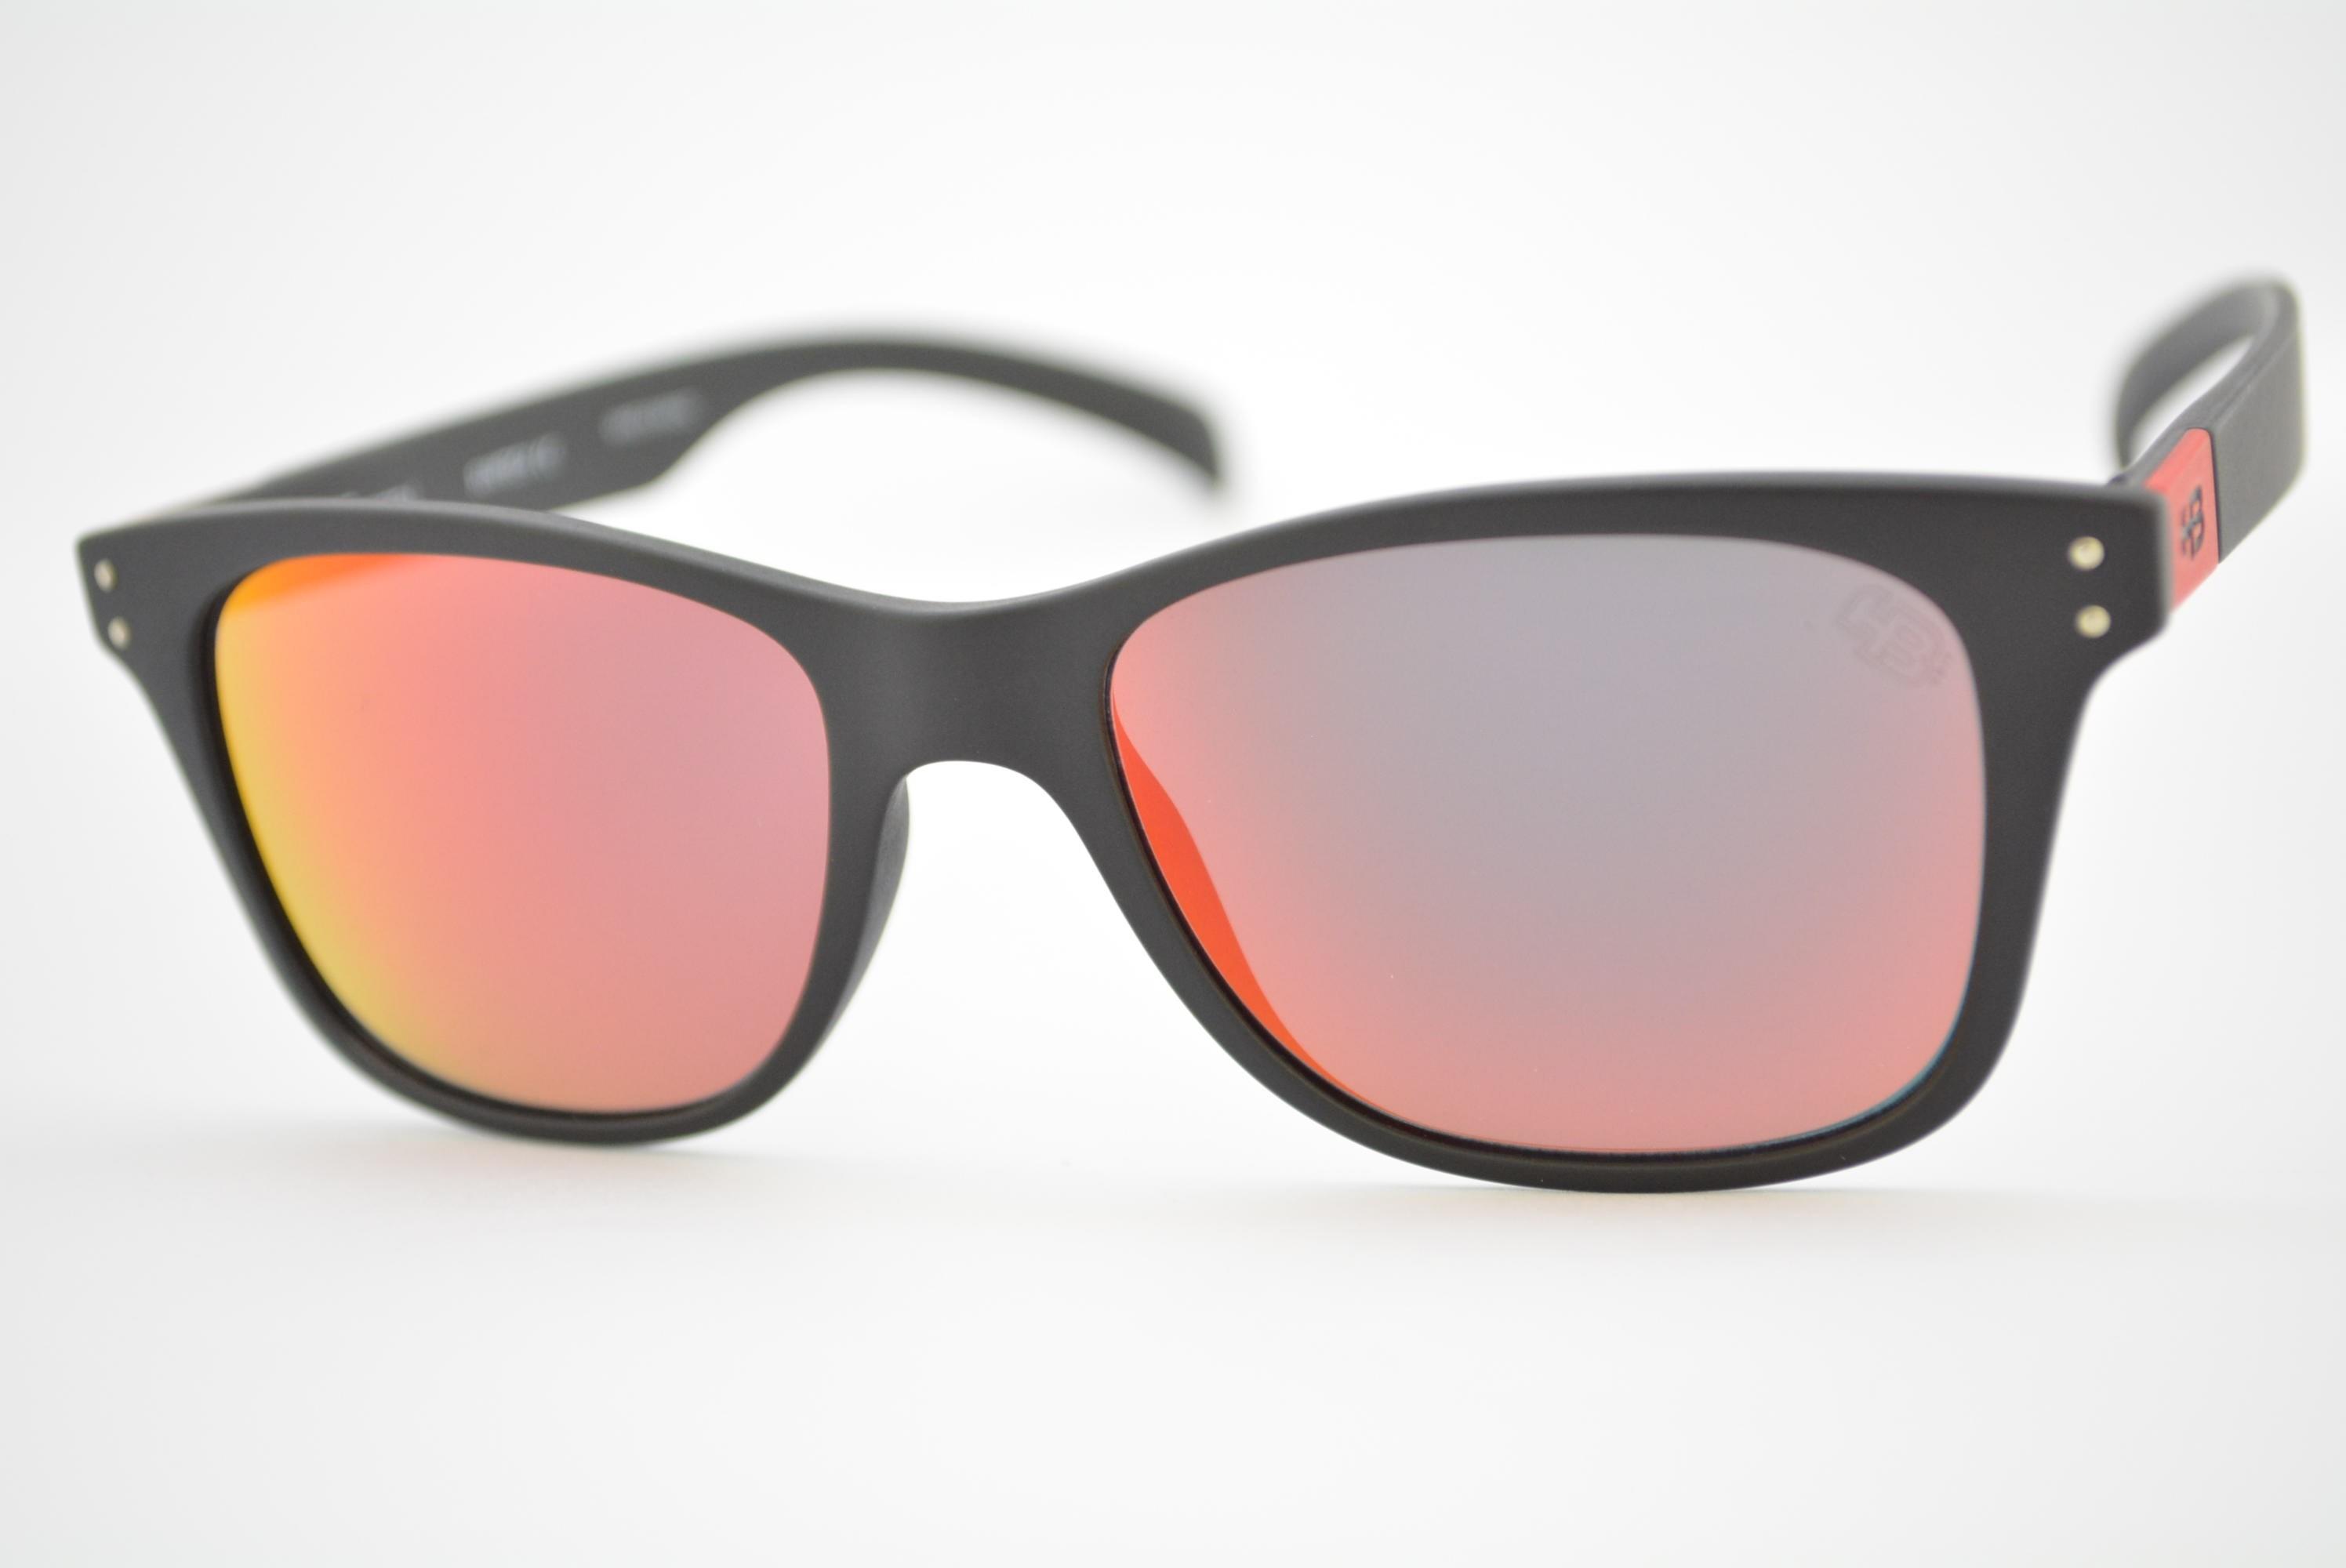 771368127 óculos de sol HB teen mod land shark II 90123001 Ótica Cardoso